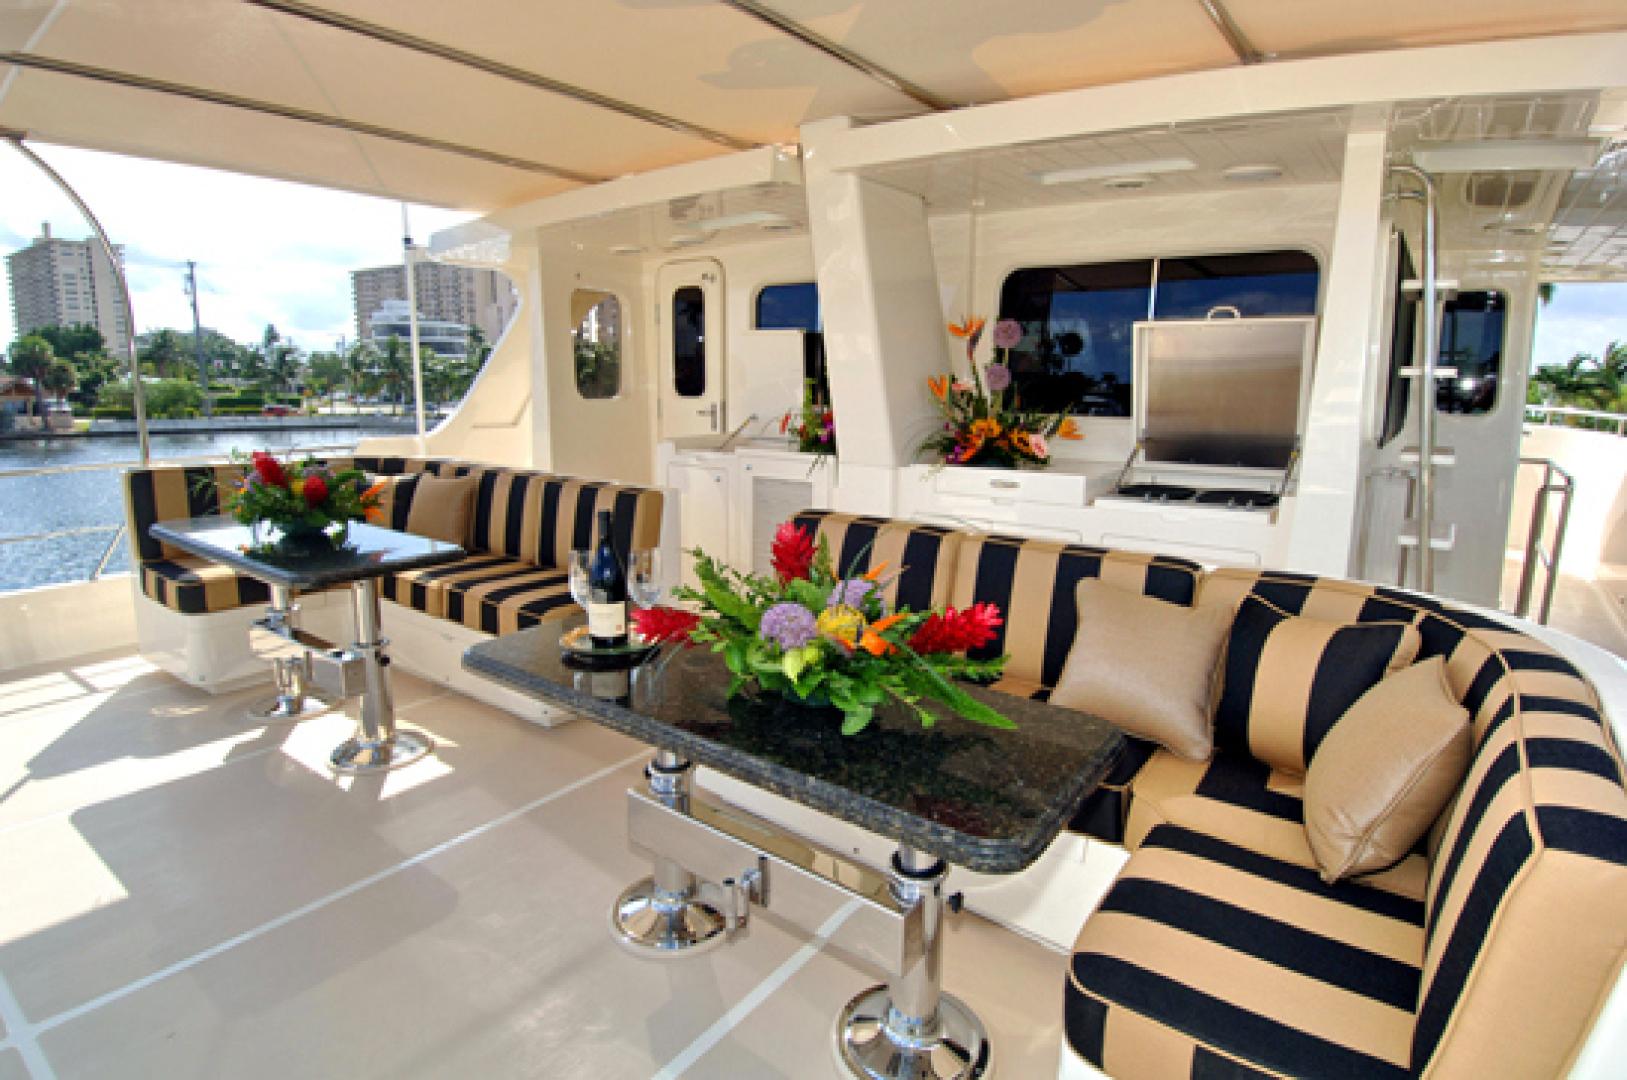 Offshore Yachts-Motoryacht 2020 -United States-1117793   Thumbnail